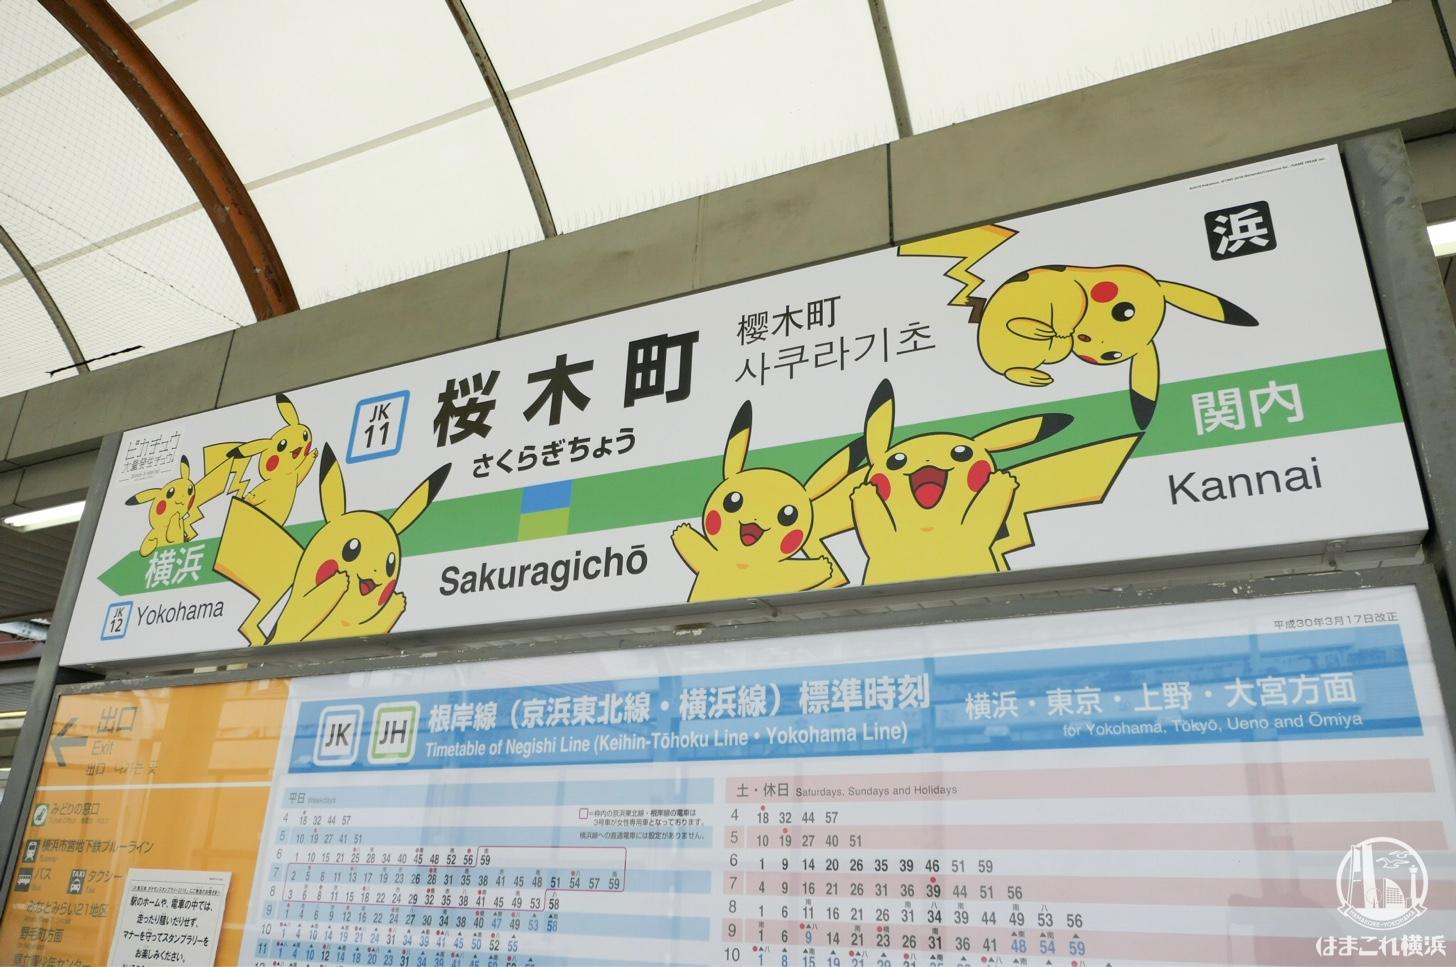 JR桜木町駅 上り線(横浜駅方面)ピカチュウ装飾